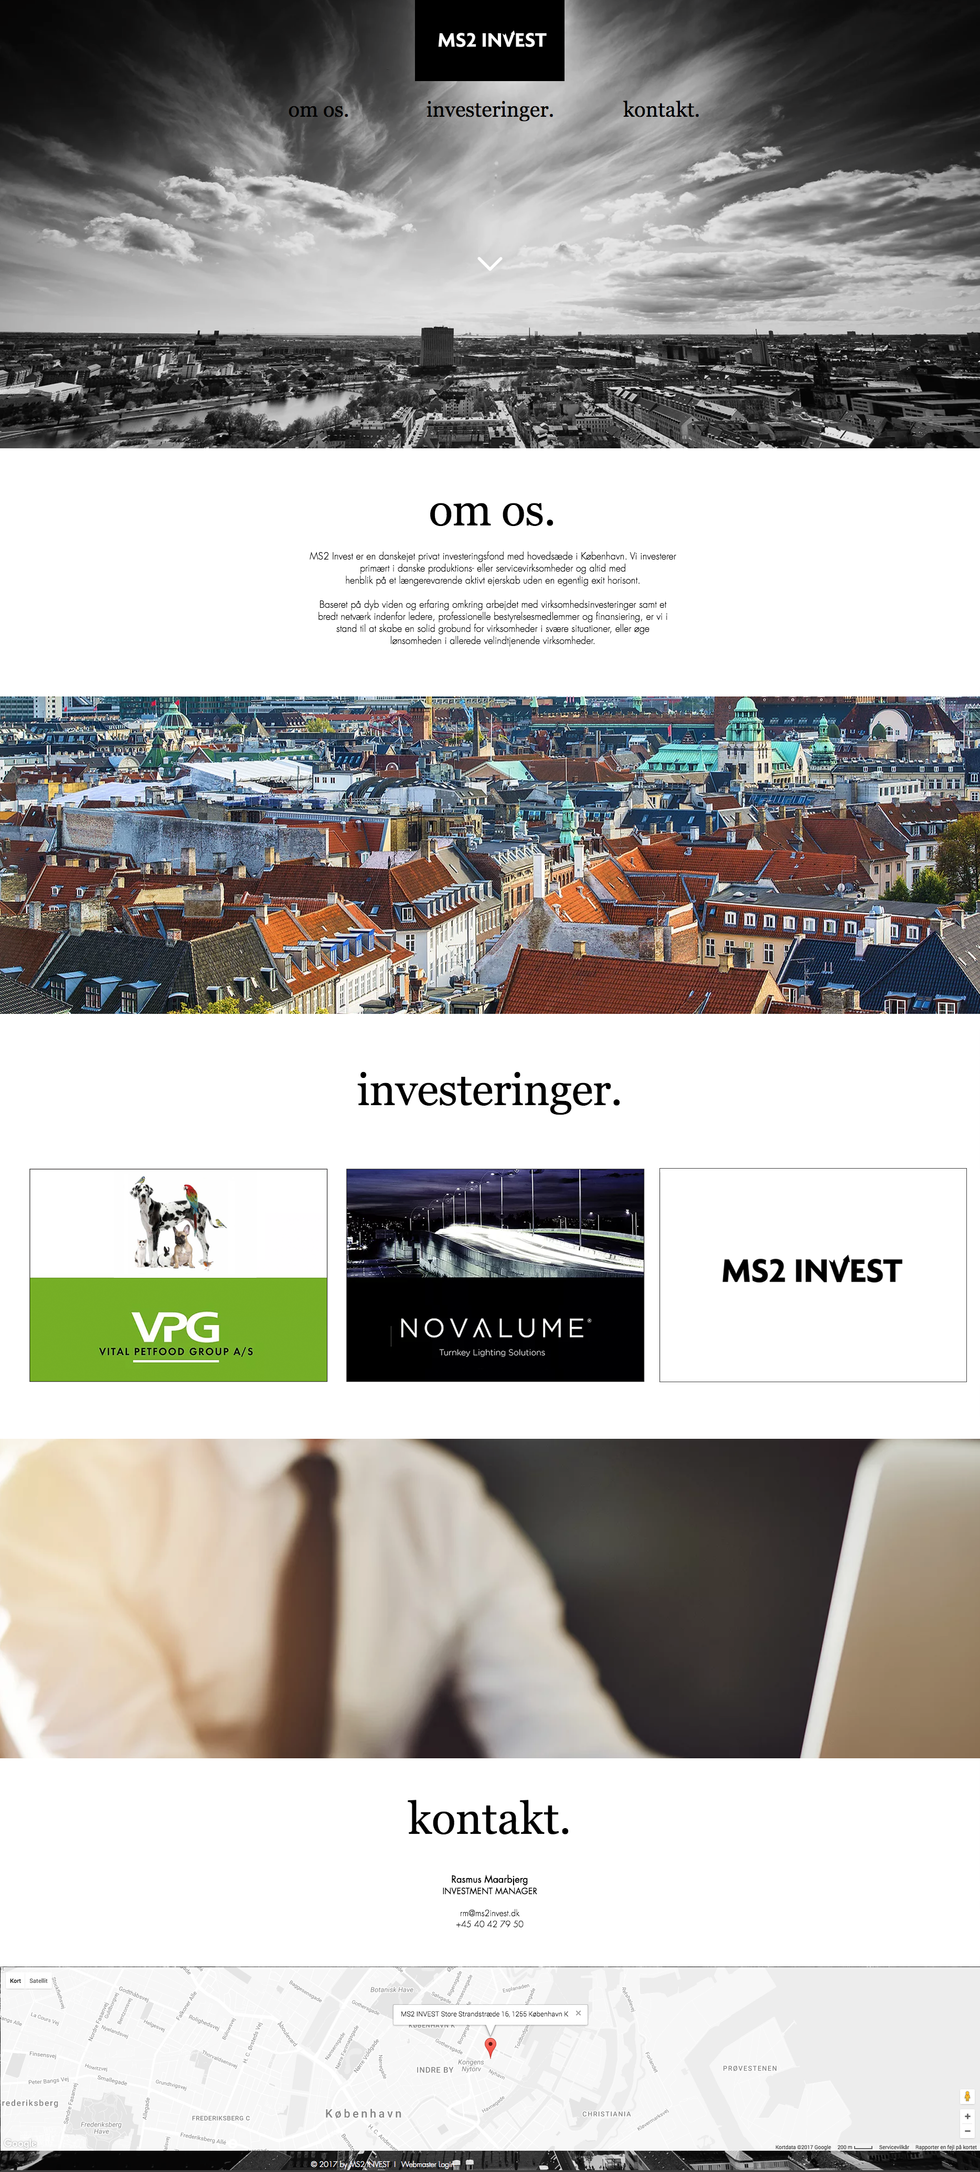 ms2invest.dk